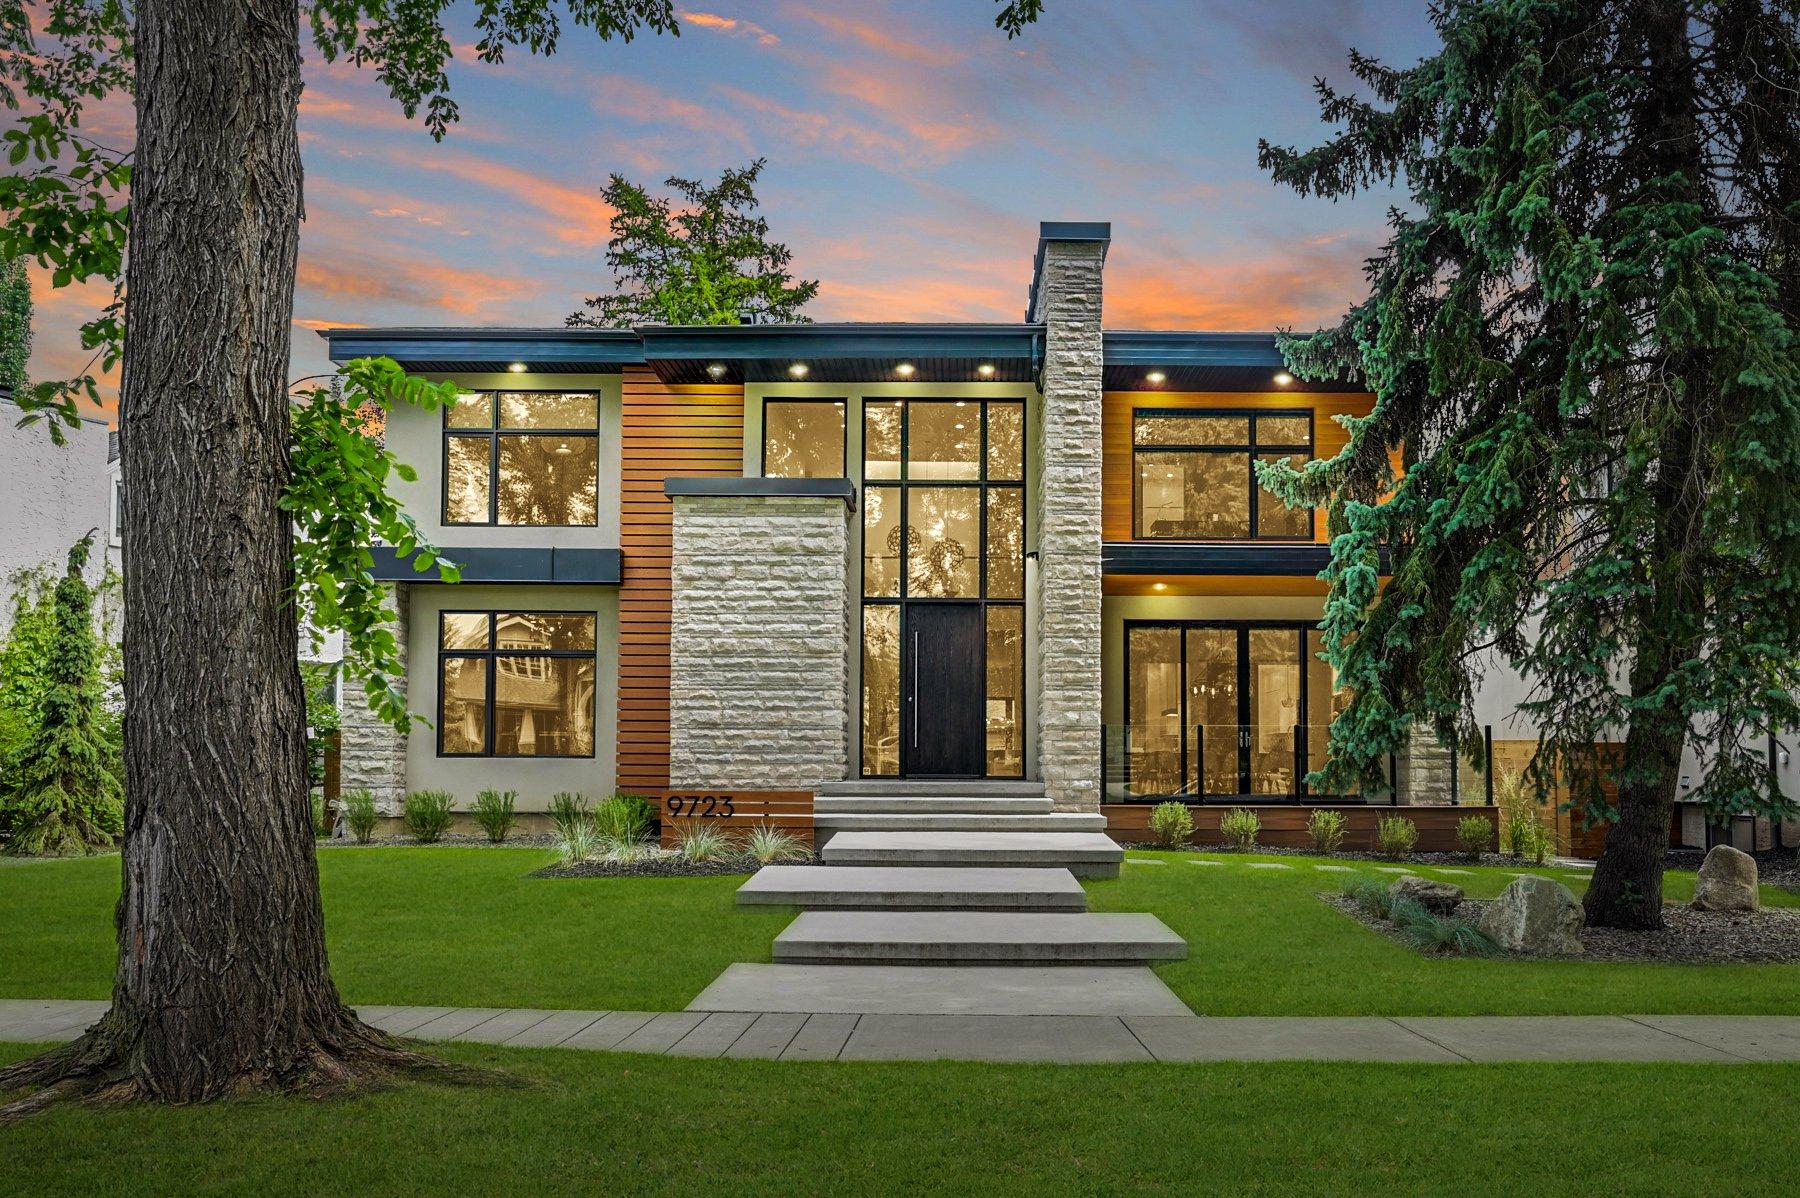 Main Photo: 9723 145 Street NW: Edmonton House for sale